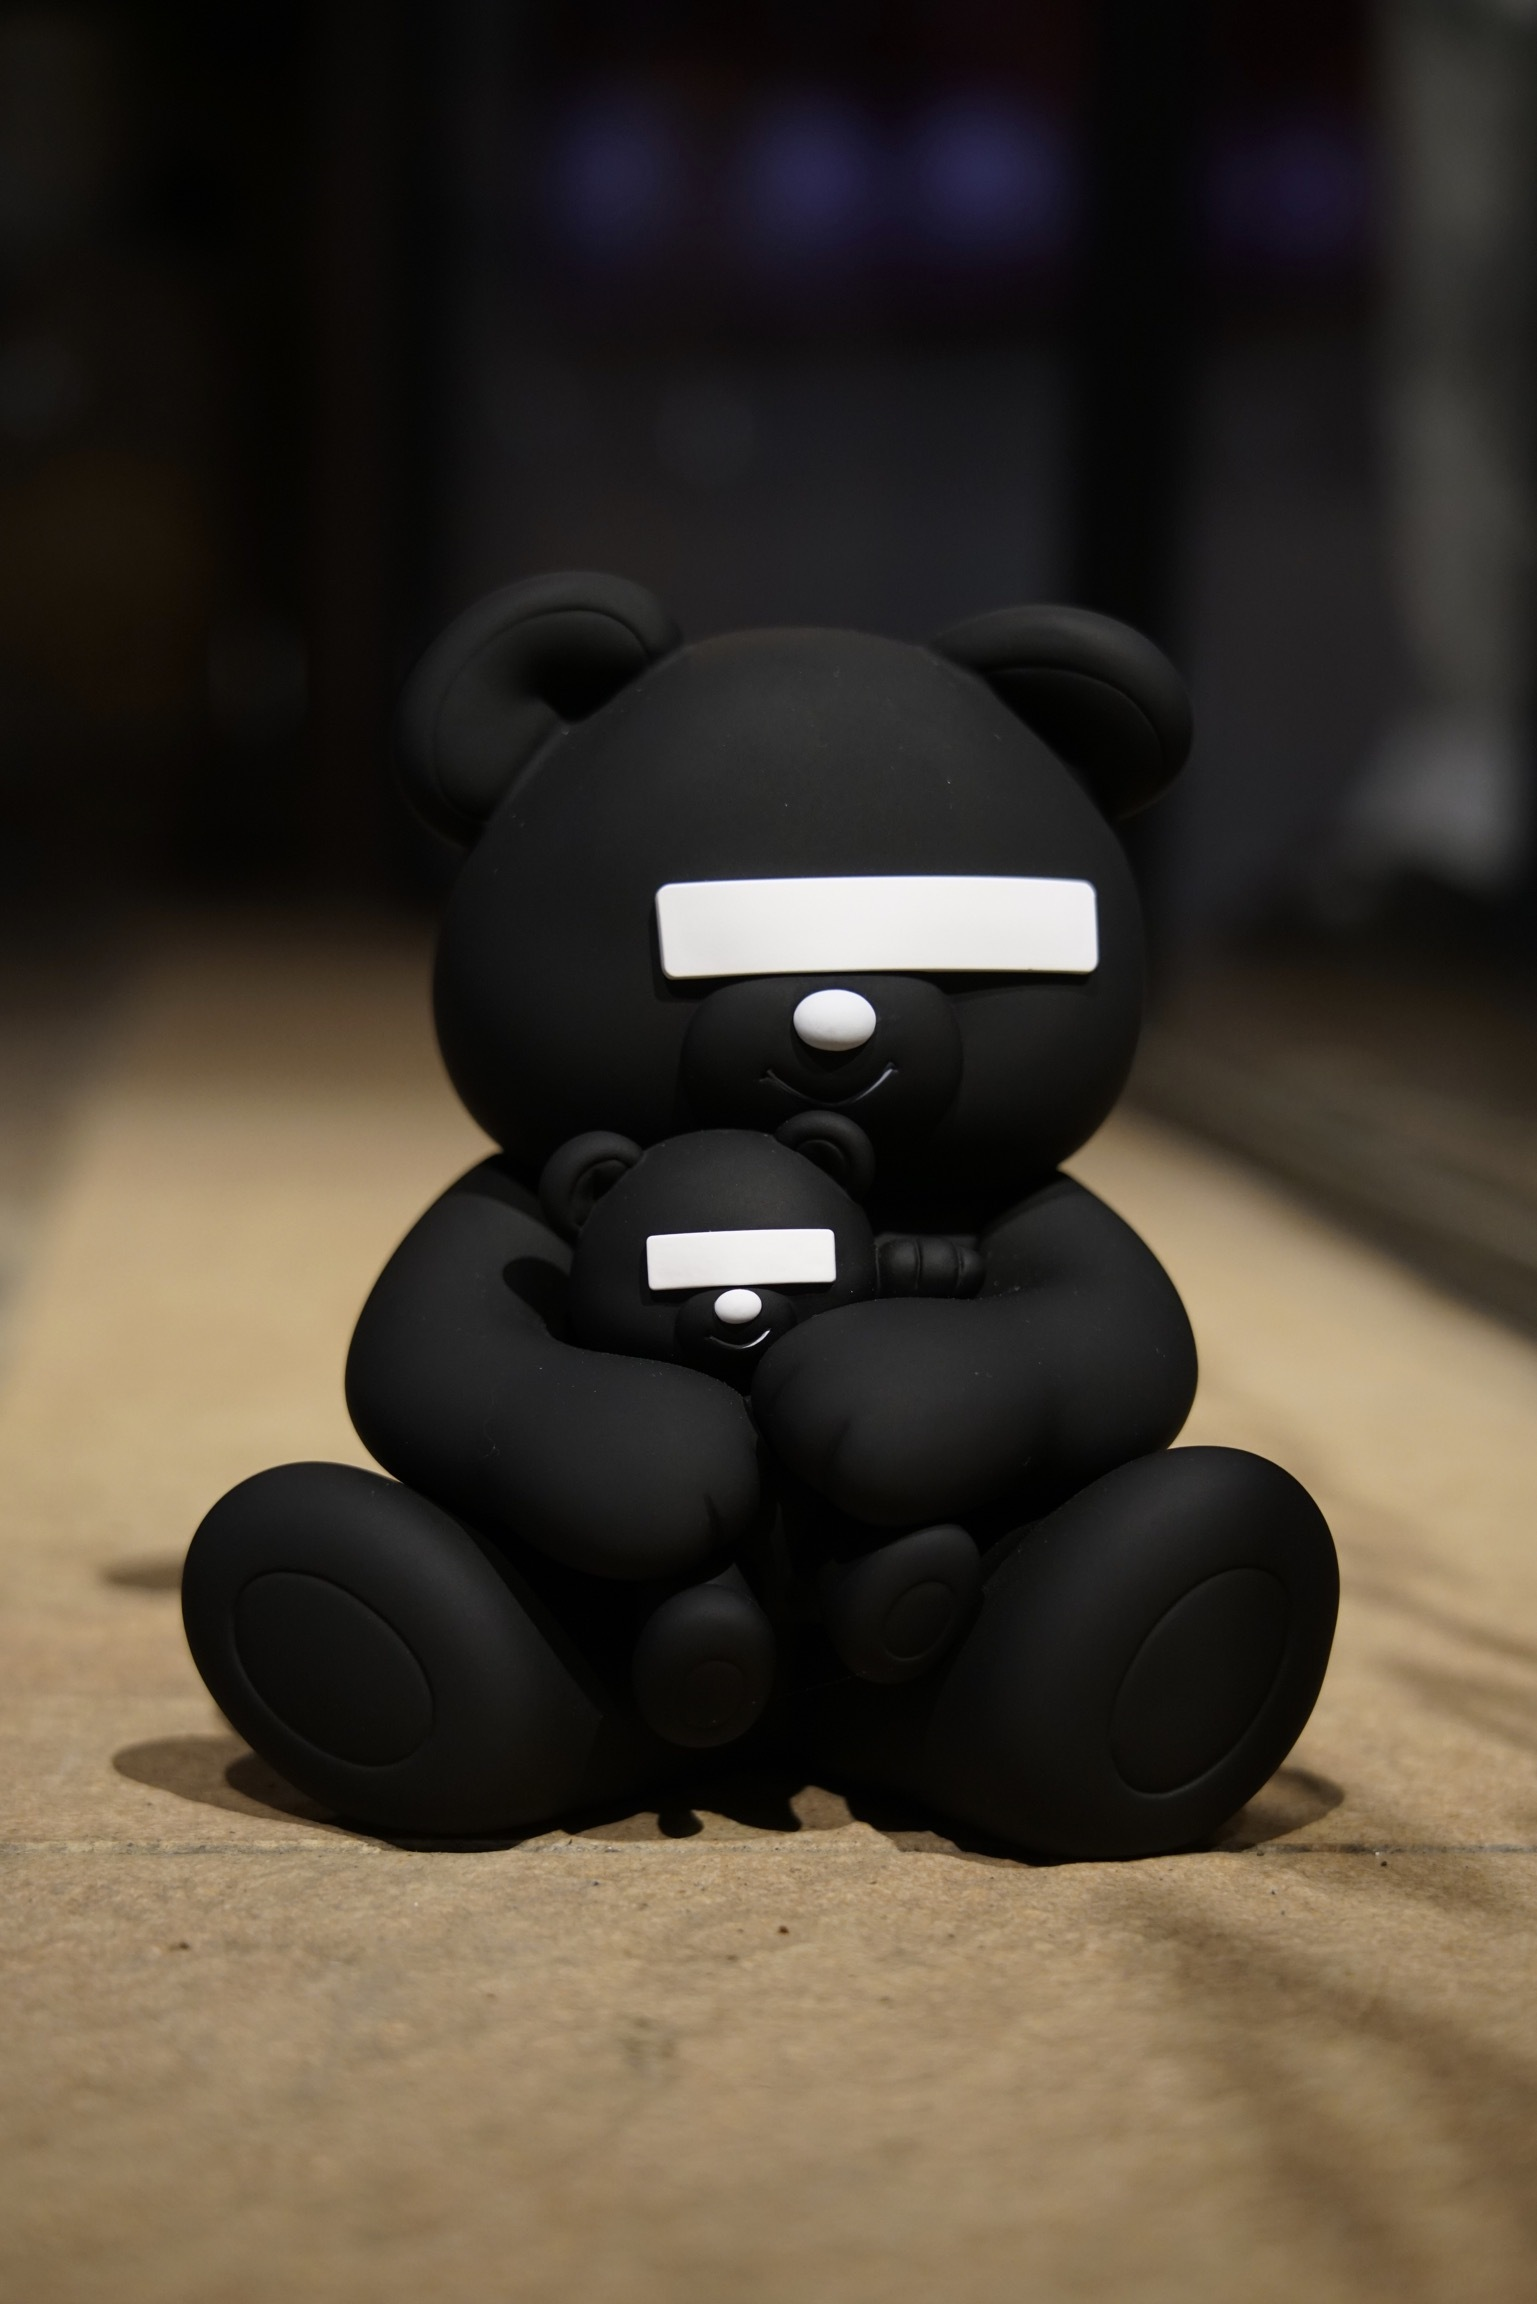 UCX9Z02 VCD UNDERCOVER BEAR FIGURE 【MEDICOMTOY】